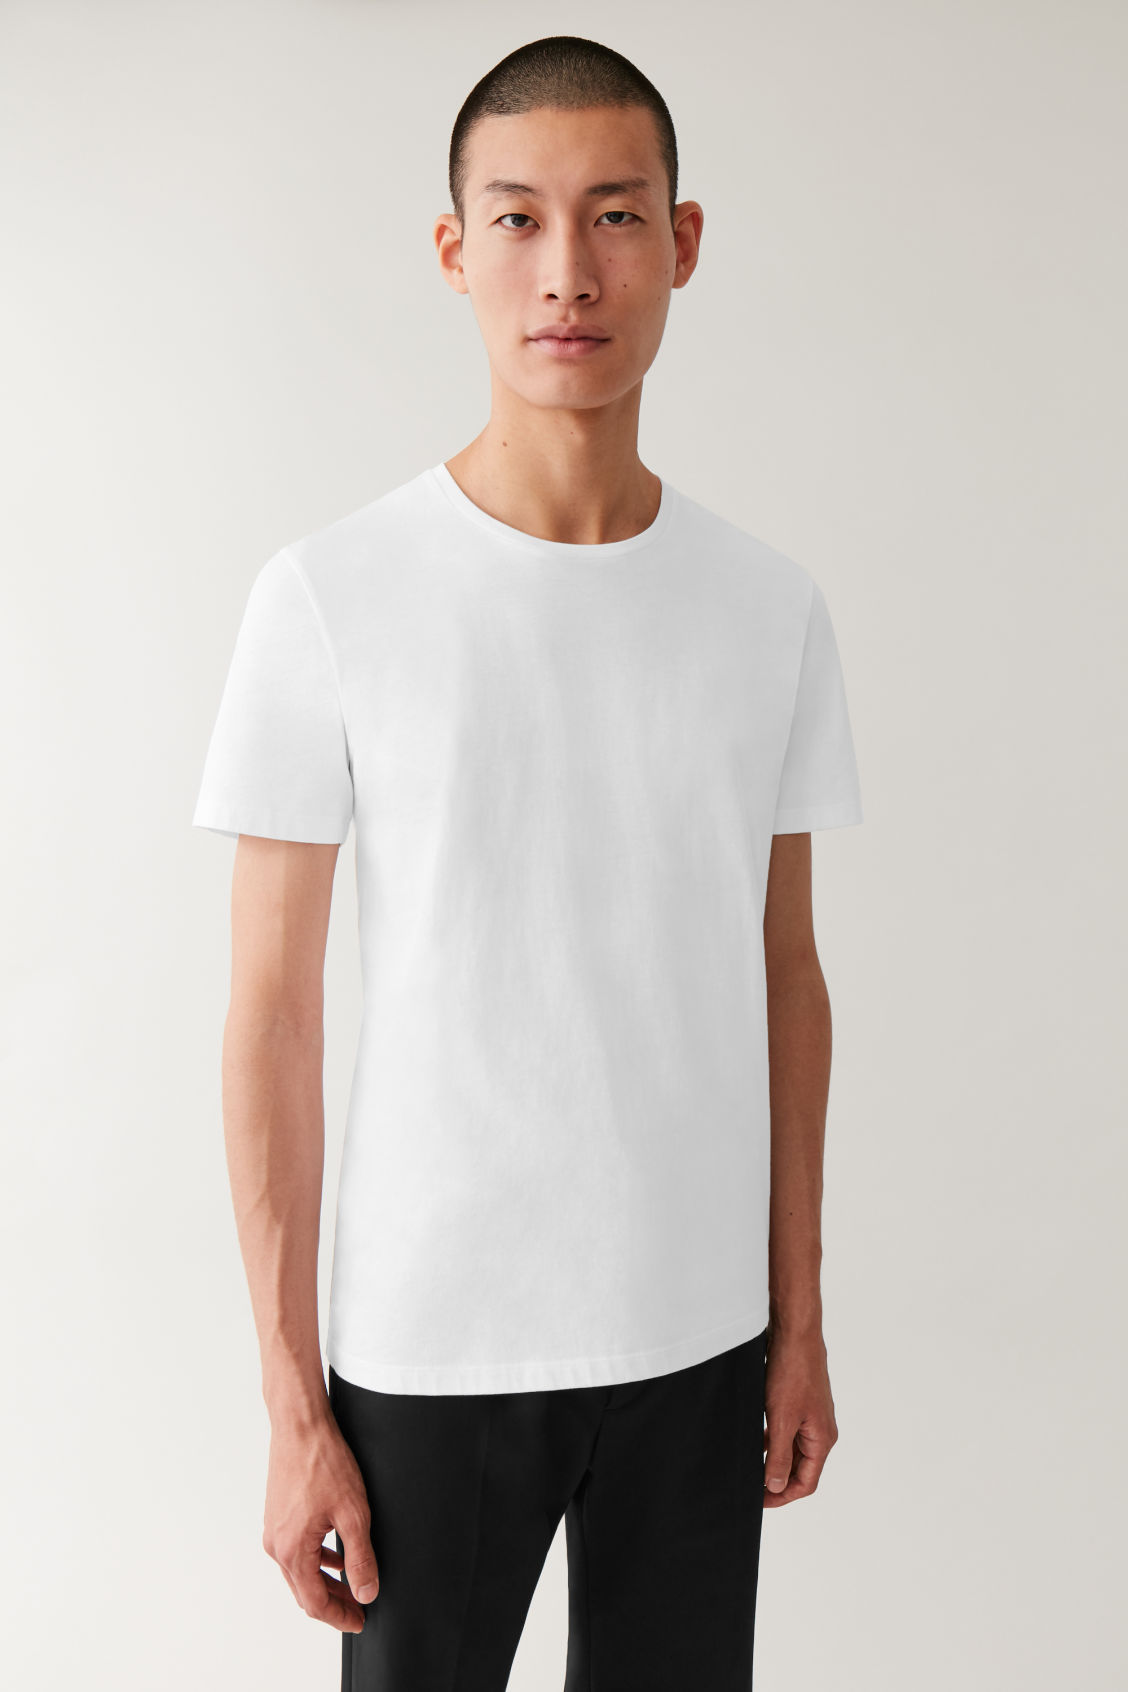 ROUND NECK T SHIRT White Round neck T shirts COS